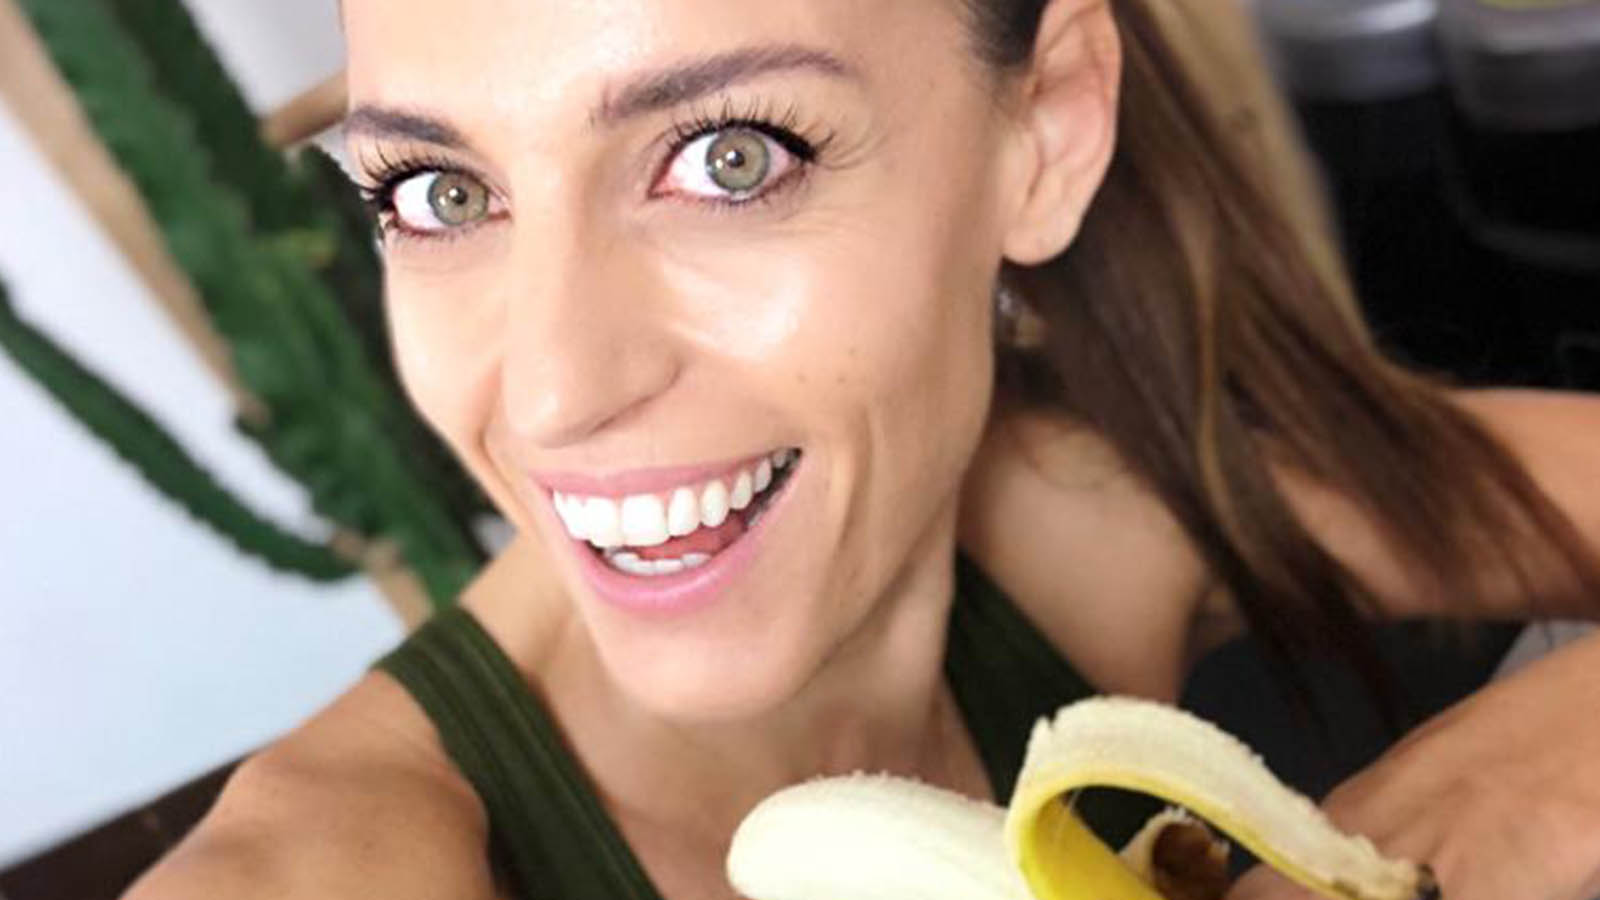 Banana post allenamento